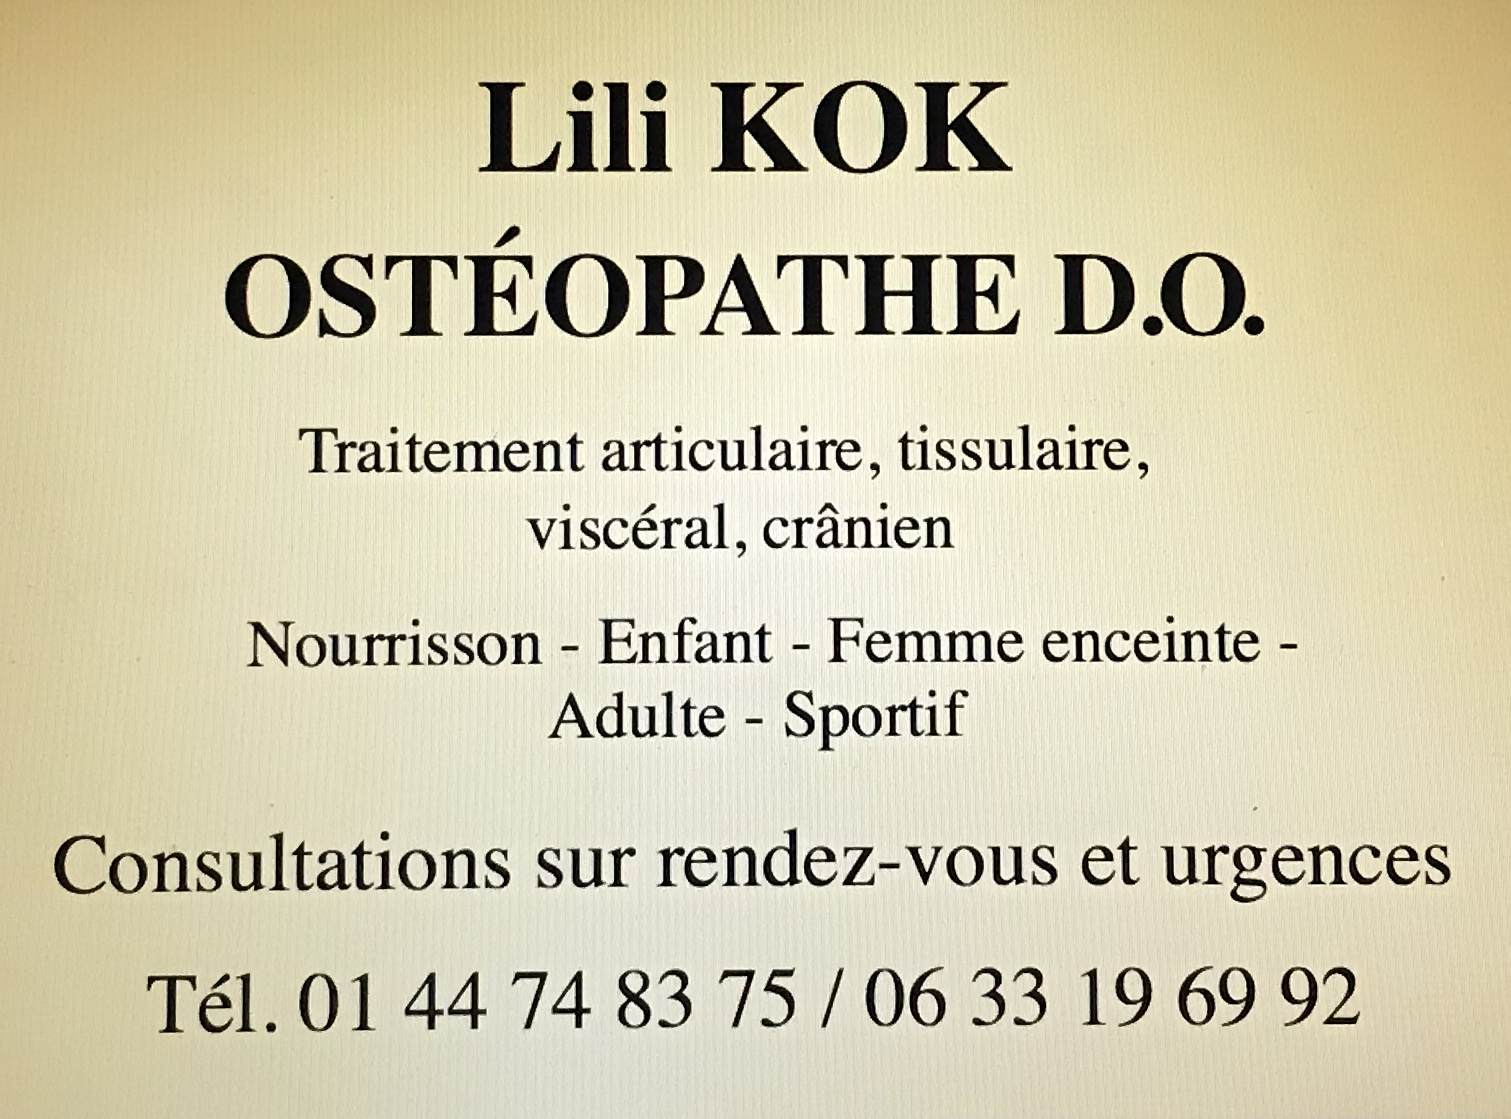 Lili Kok - Ostéopathe D.O.